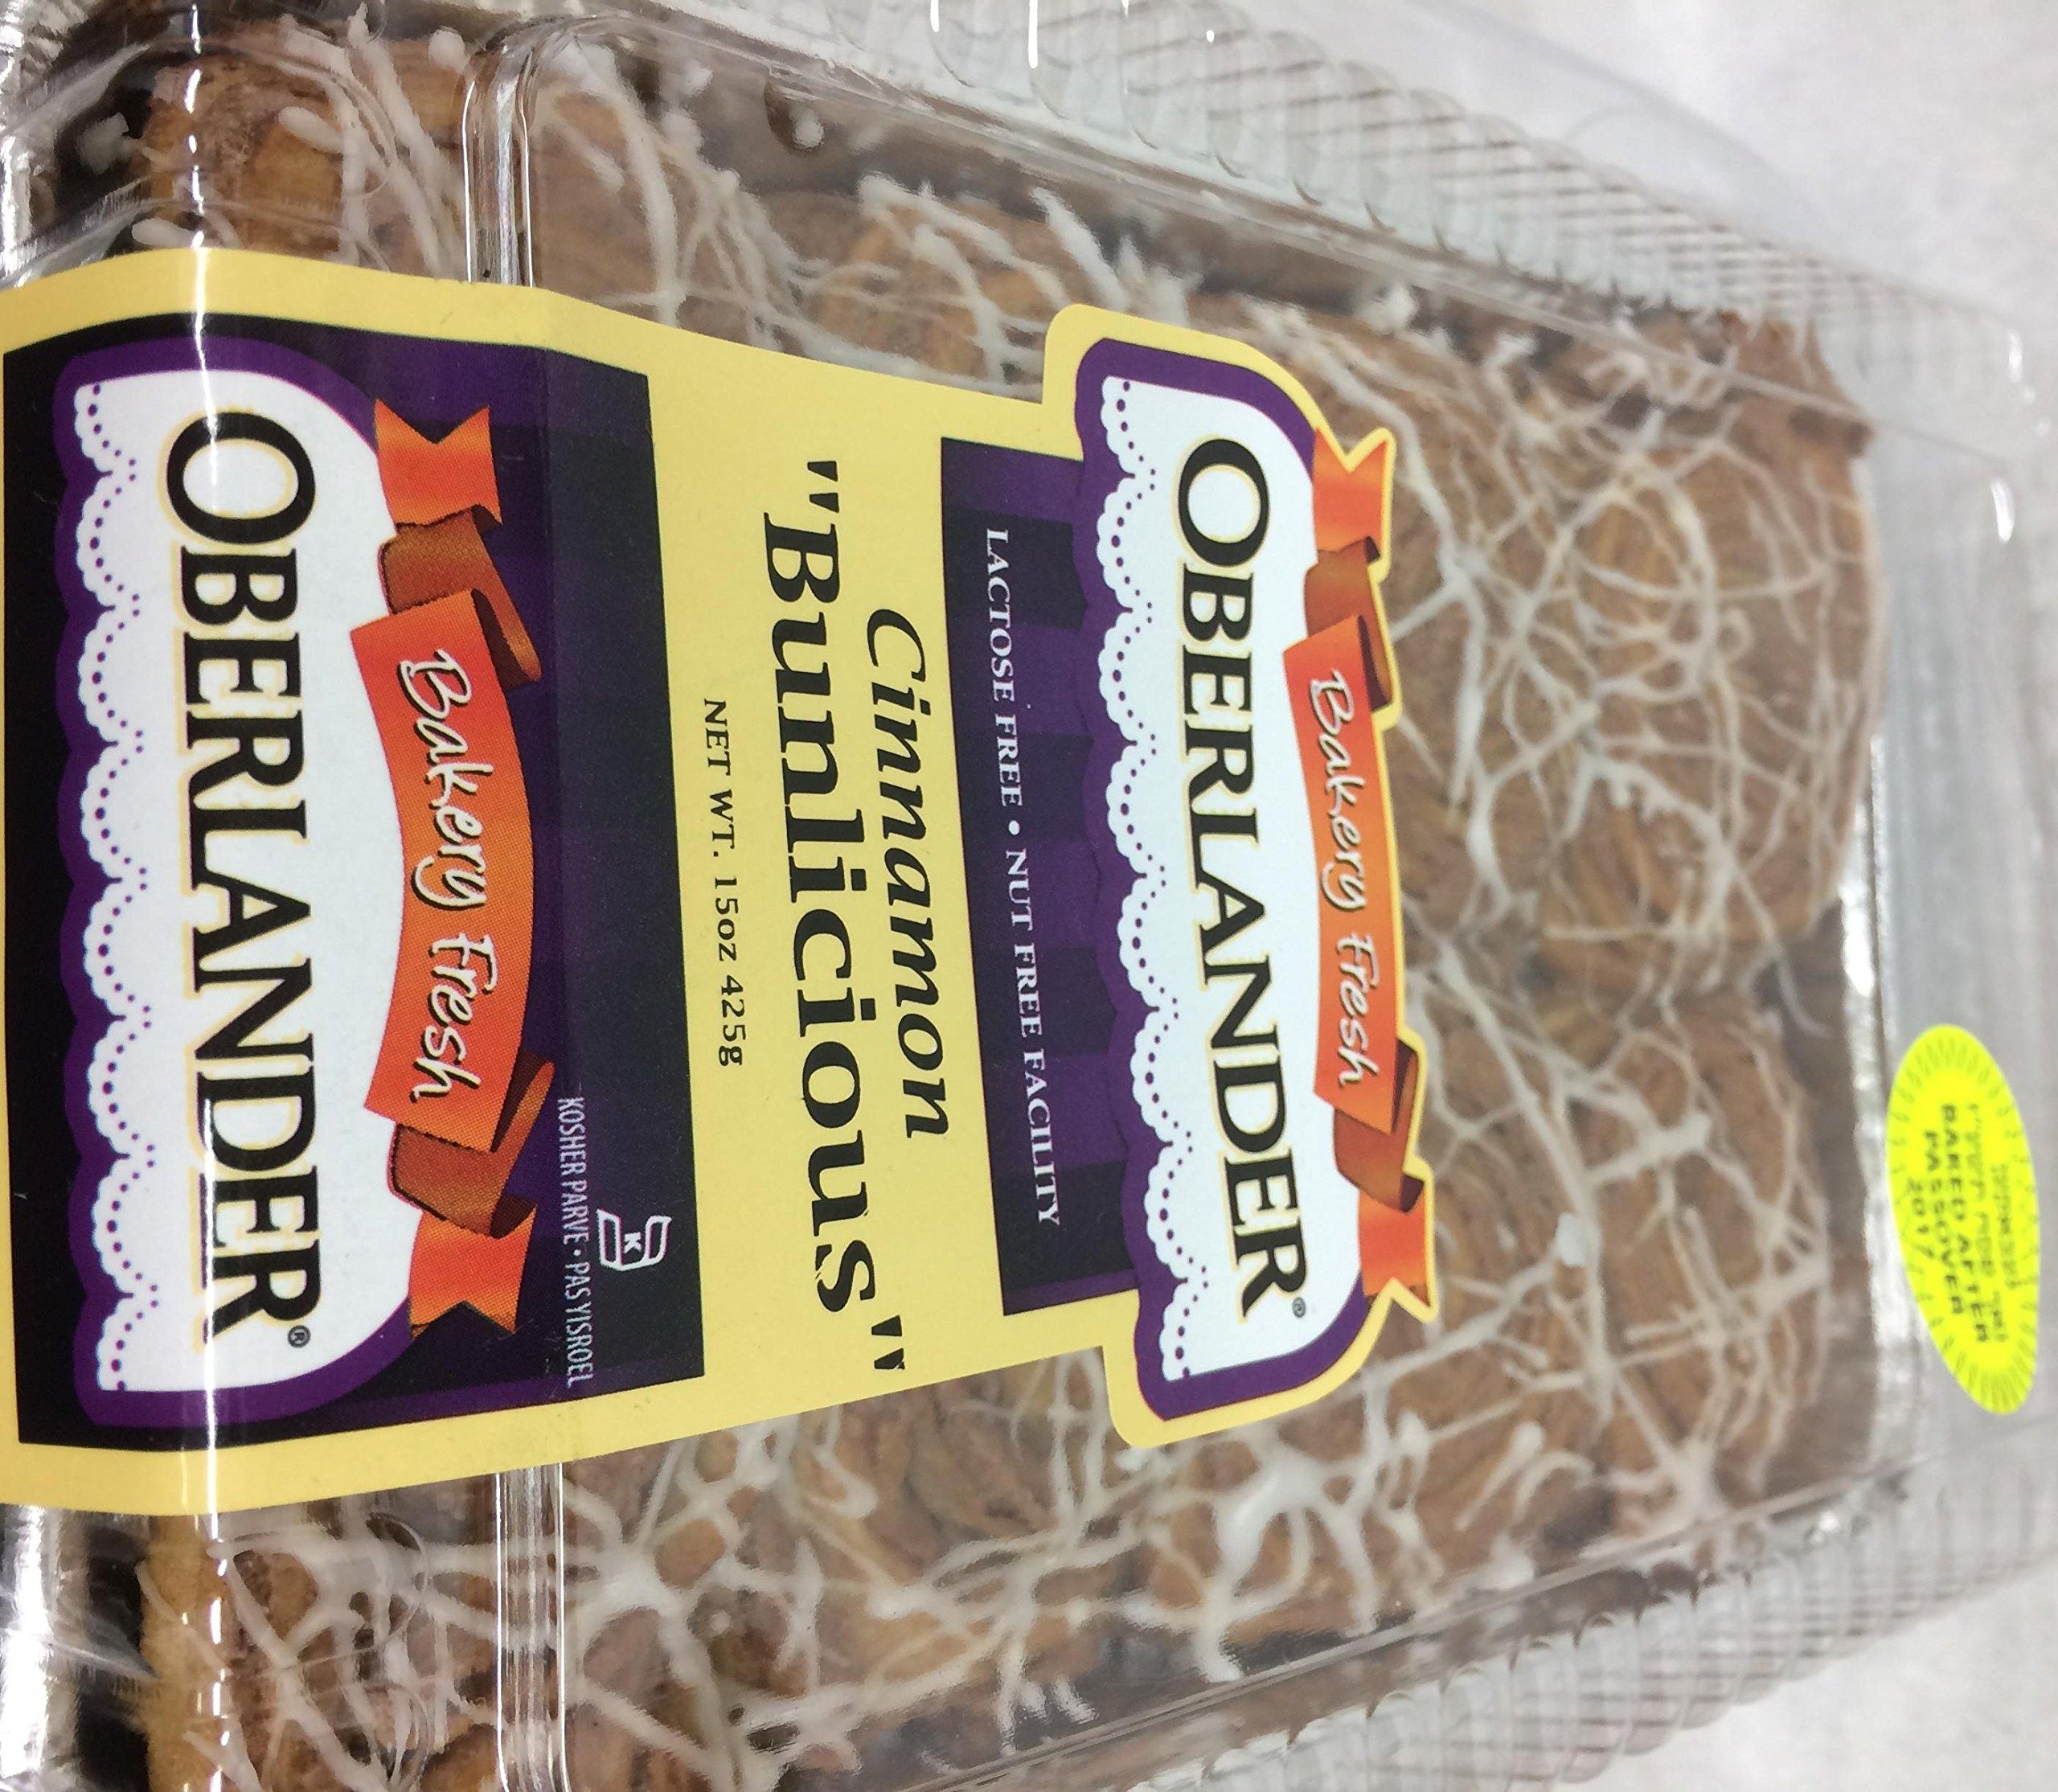 Oberlander Cinnamon Bunlicious Nut Free Facility 15 Oz. Pack Of 1.